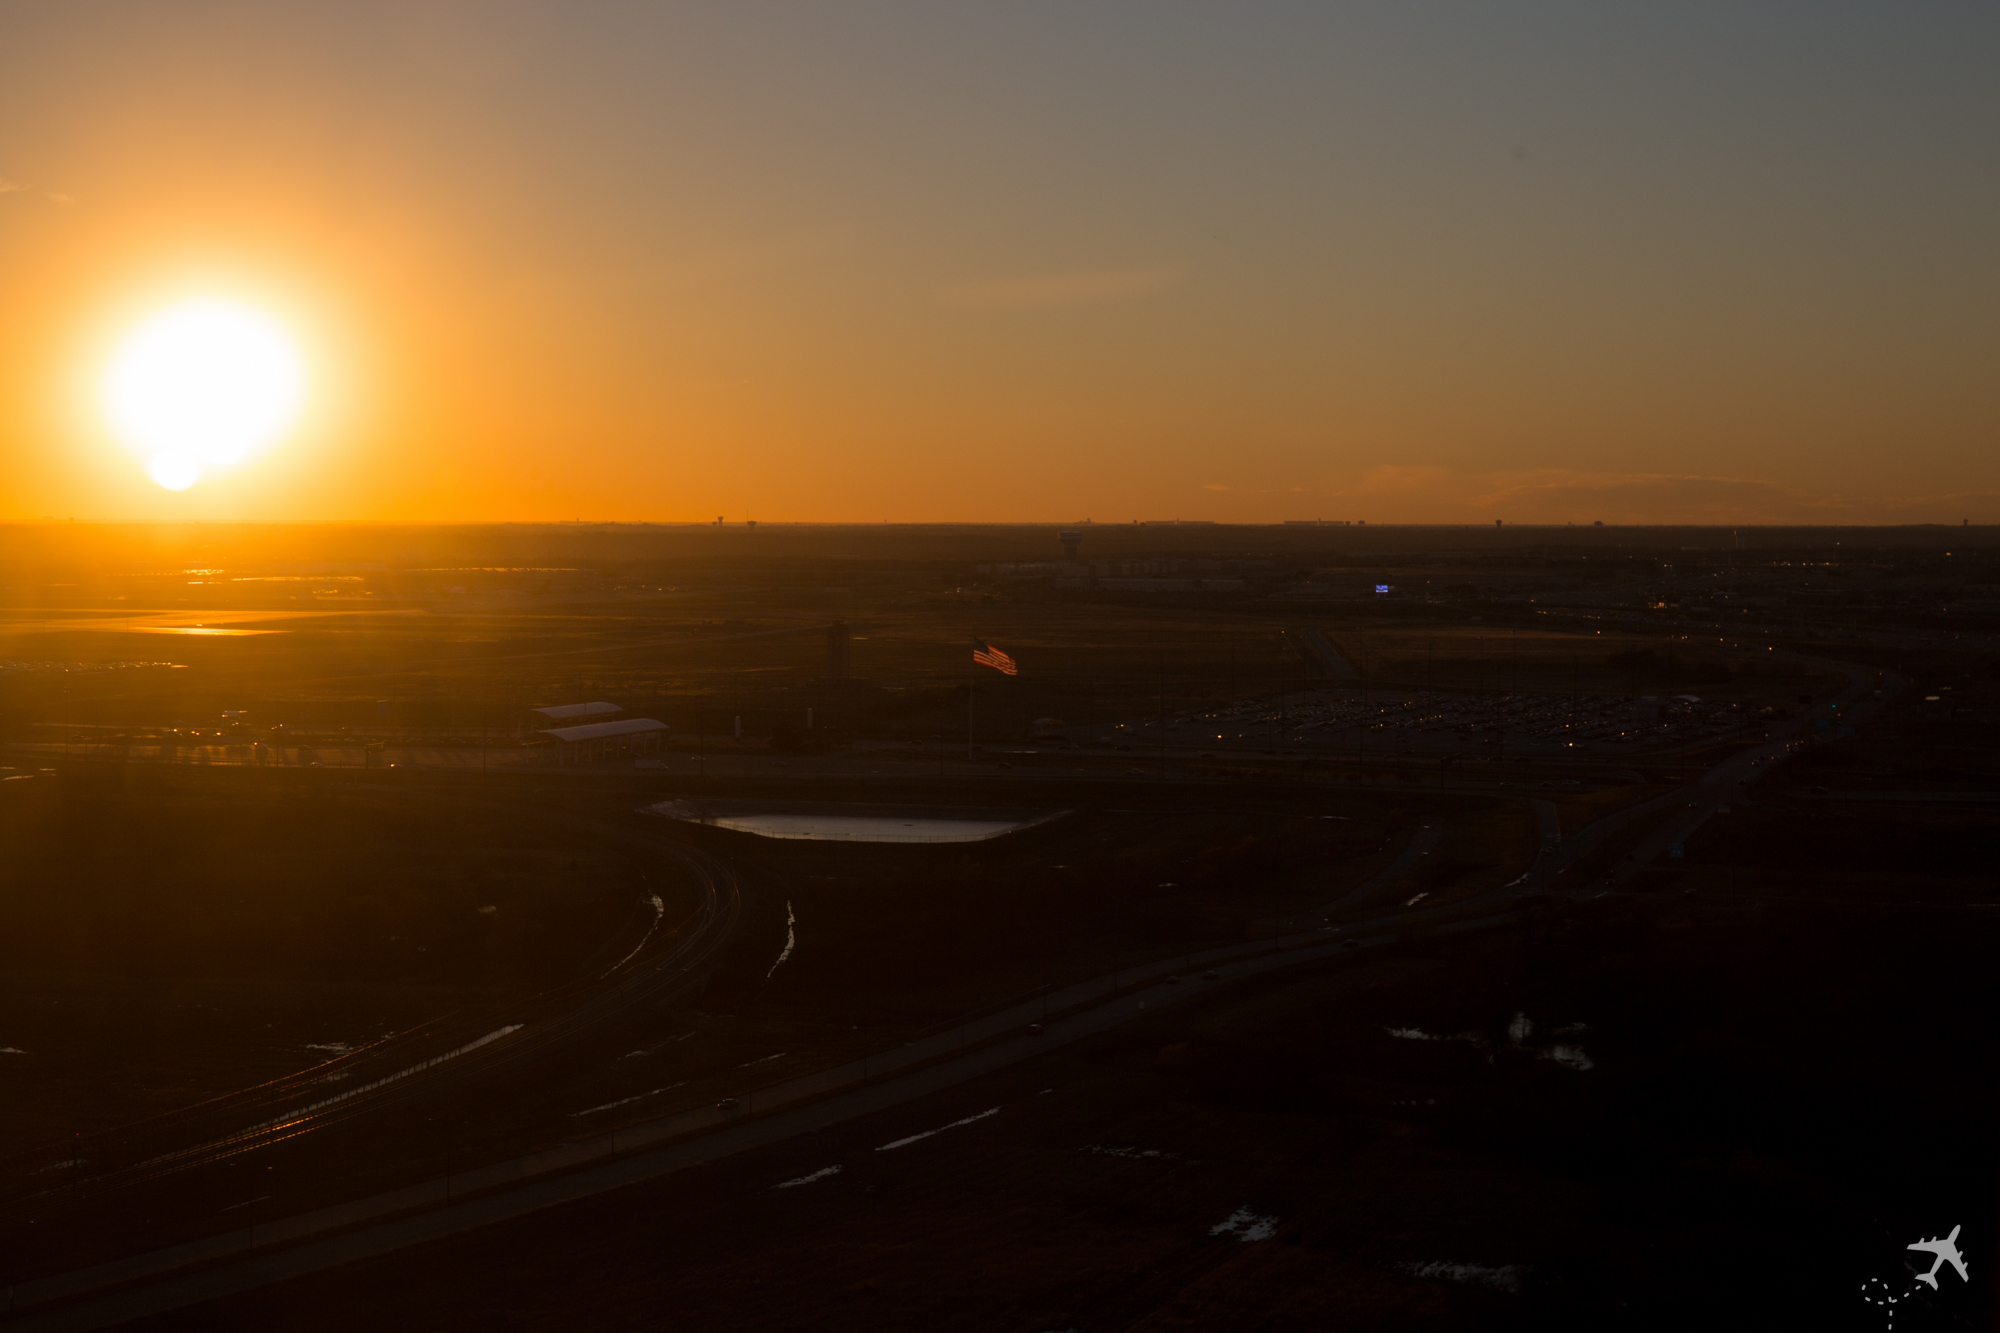 Anflug Dallas/Fort Worth International Airport [DFW]